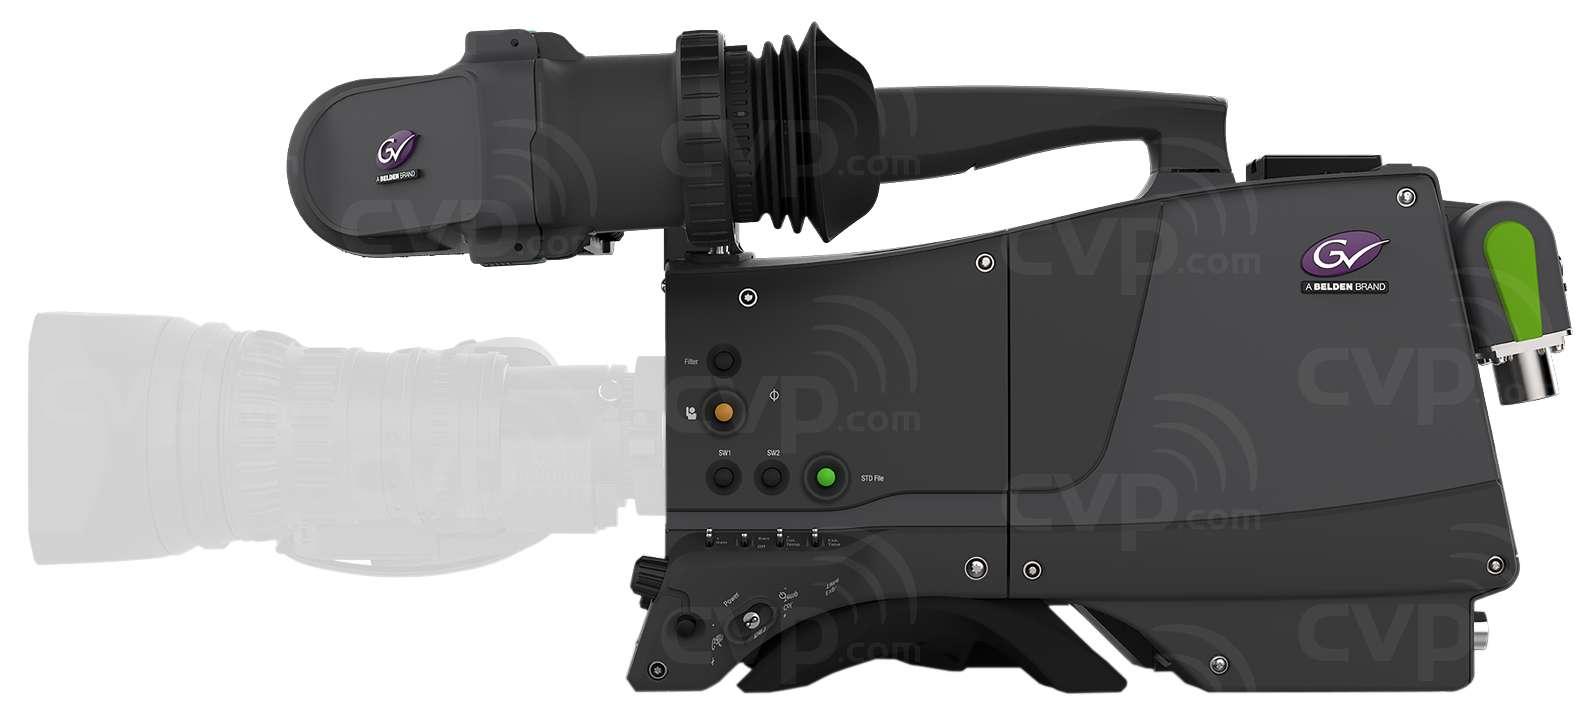 Grass Valley LDX 82 Elite (LDX-82-Elite) HDR-Capable Advanced Imaging Camera